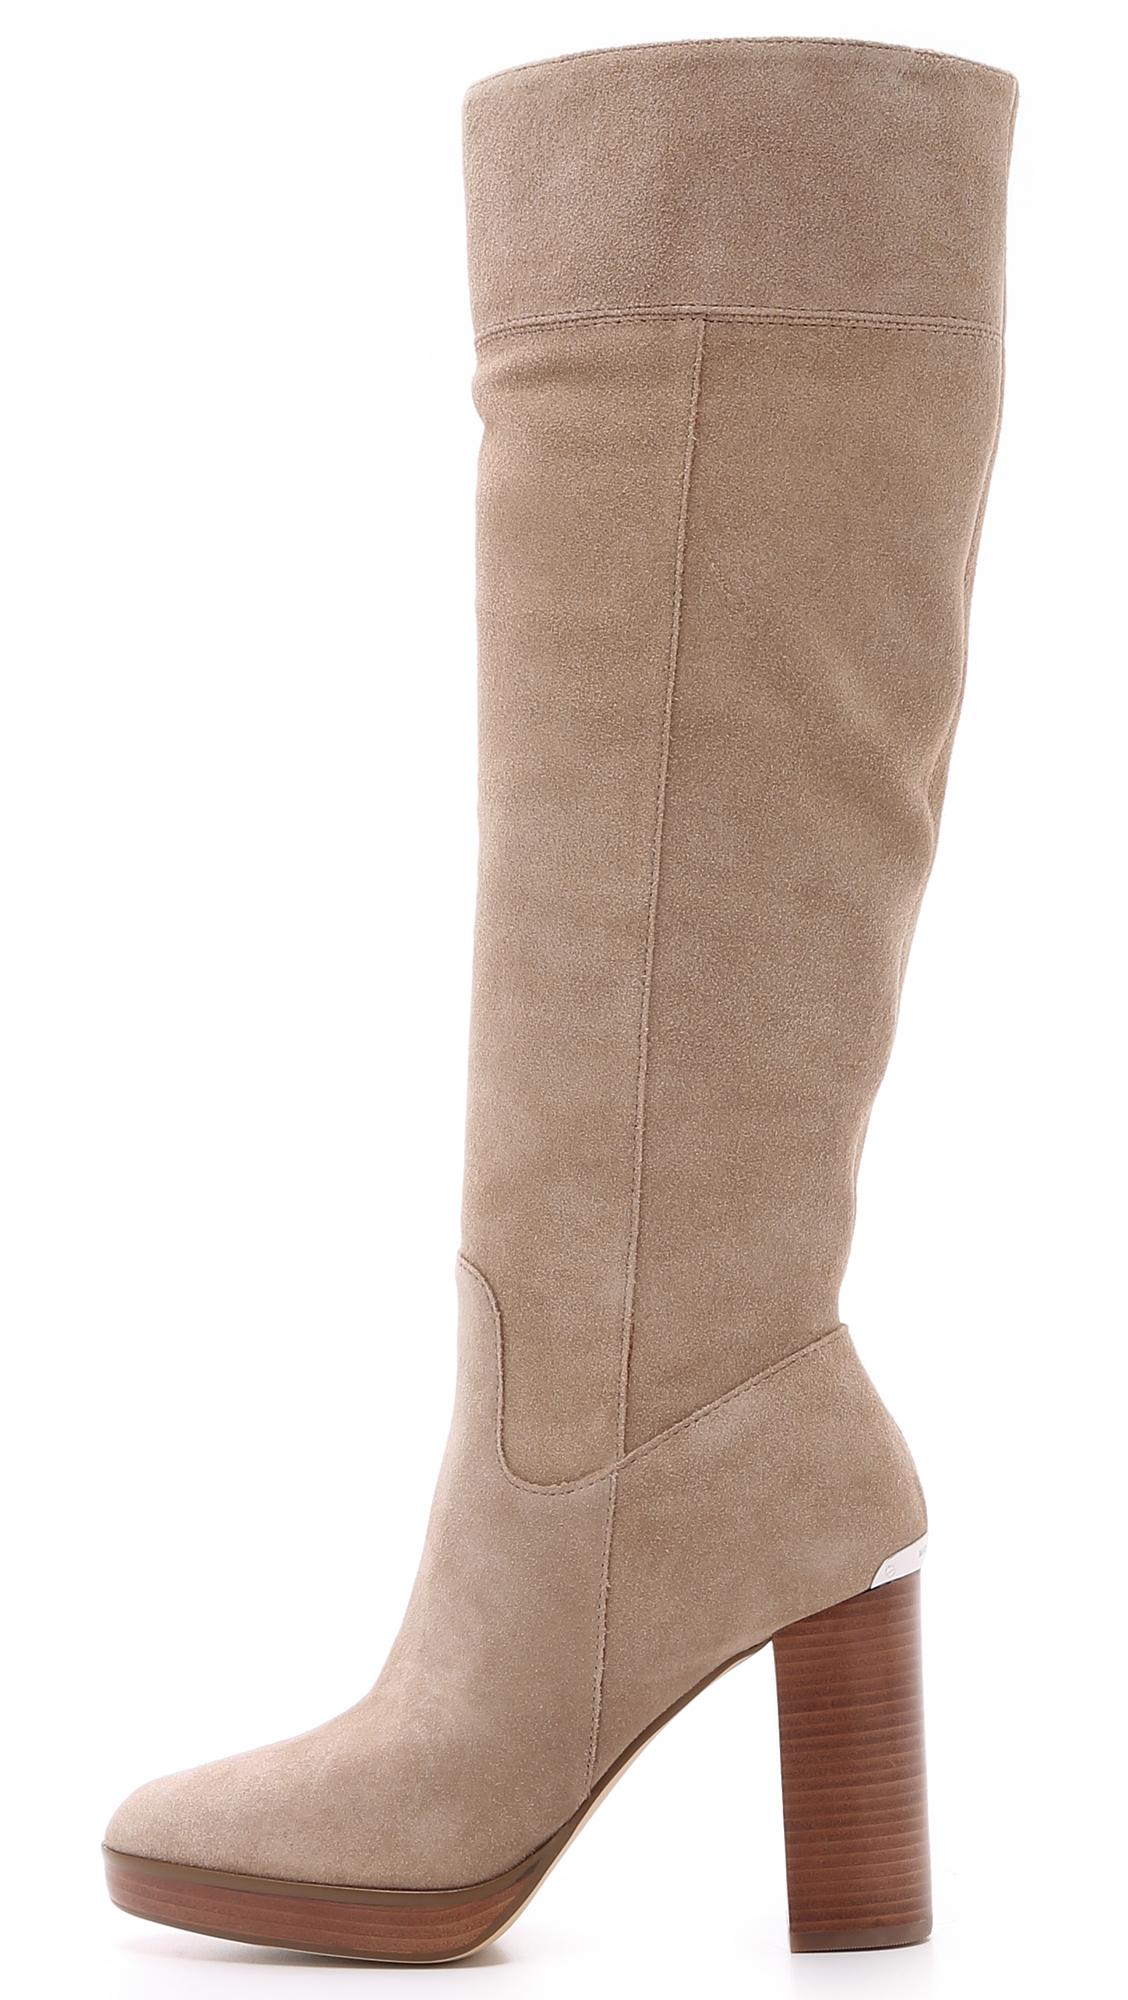 80e6e8c3571 Lyst - MICHAEL Michael Kors Regina Suede Platform Boots in Natural